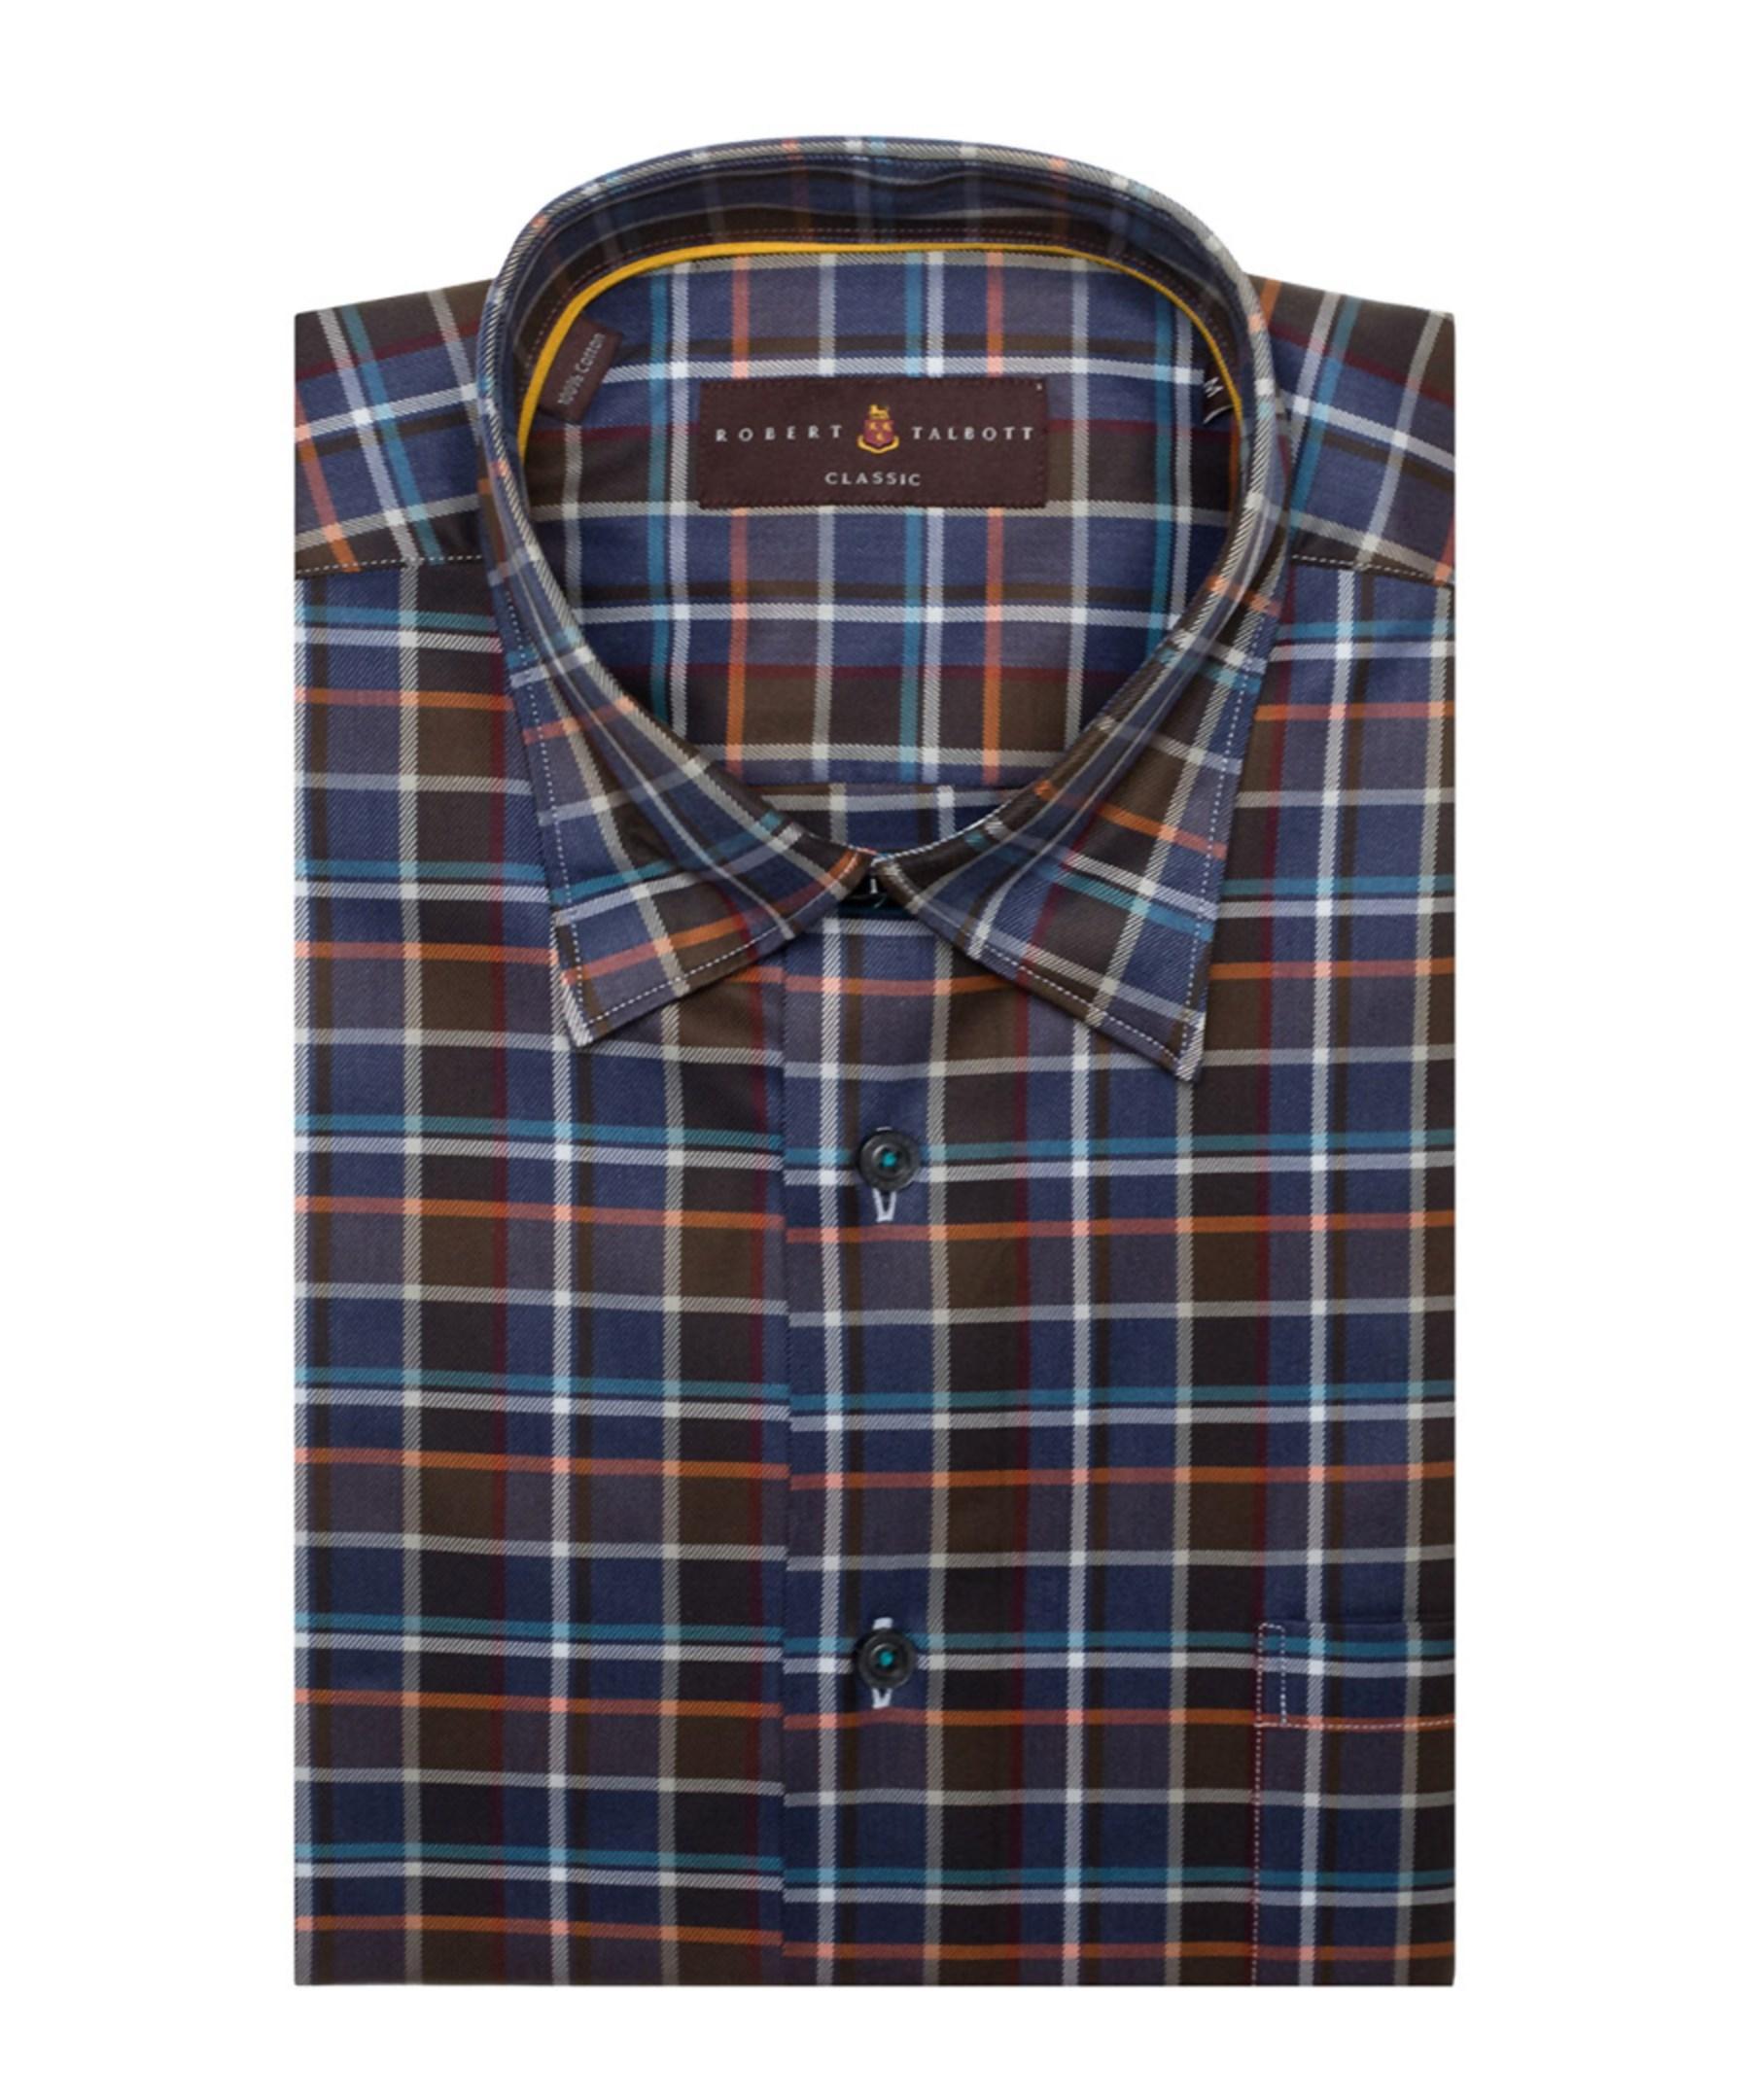 Robert talbott anderson ii classic fit woven shirt in blue for Robert talbott shirts sale